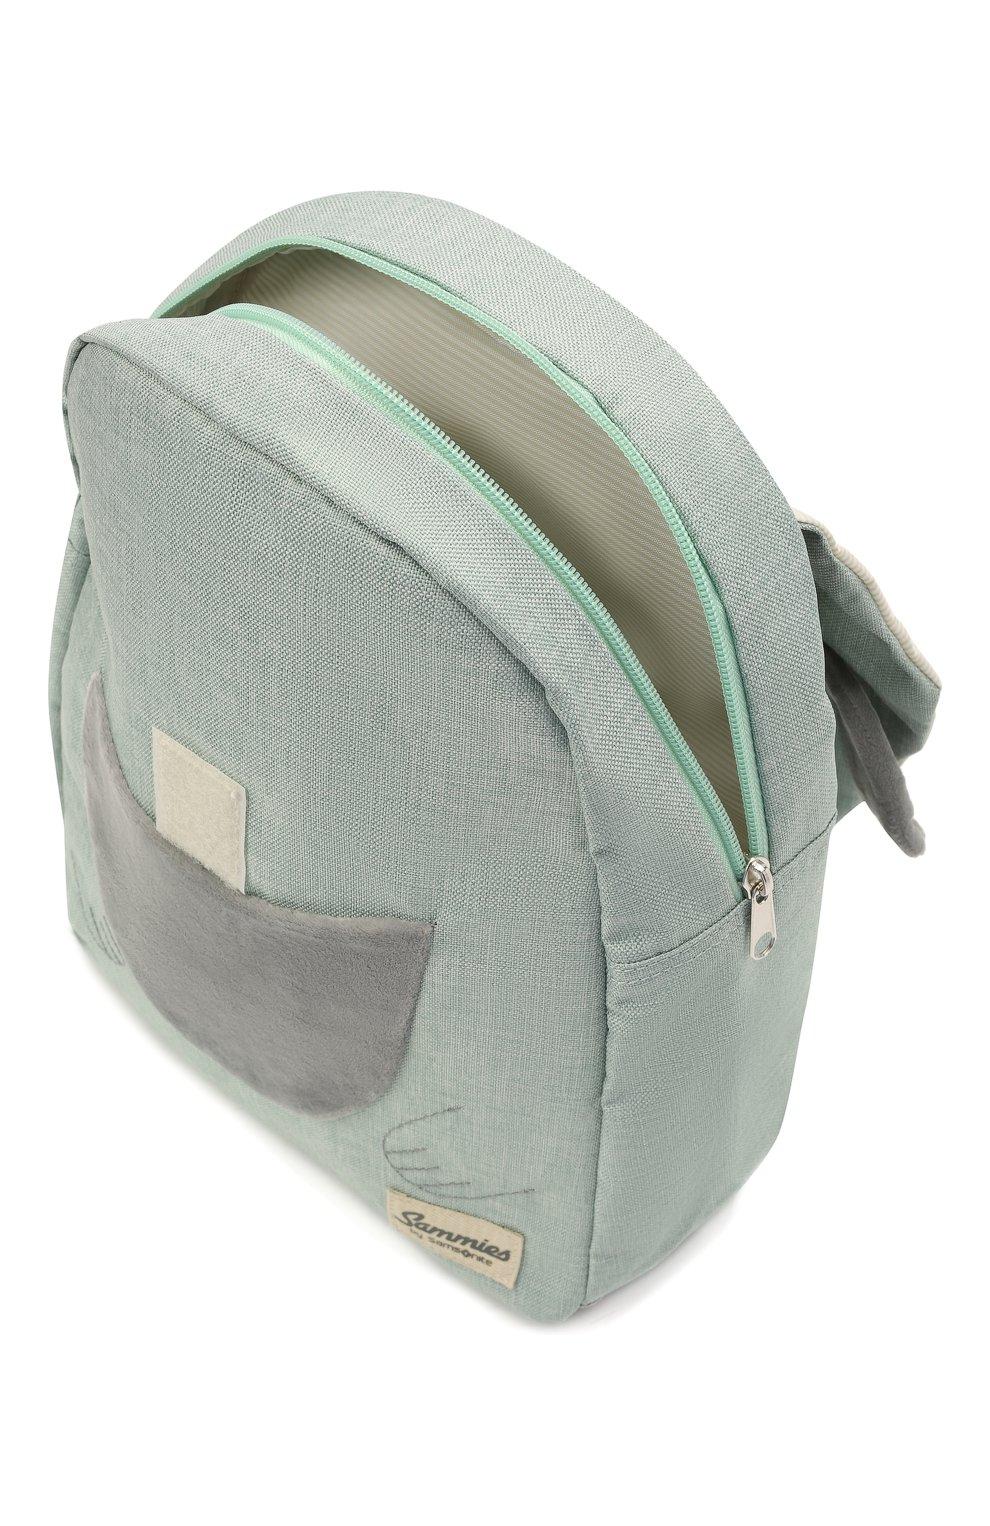 Детская рюкзак happy sammies SAMSONITE светло-зеленого цвета, арт. CD0-14038   Фото 3 (Материал: Текстиль)